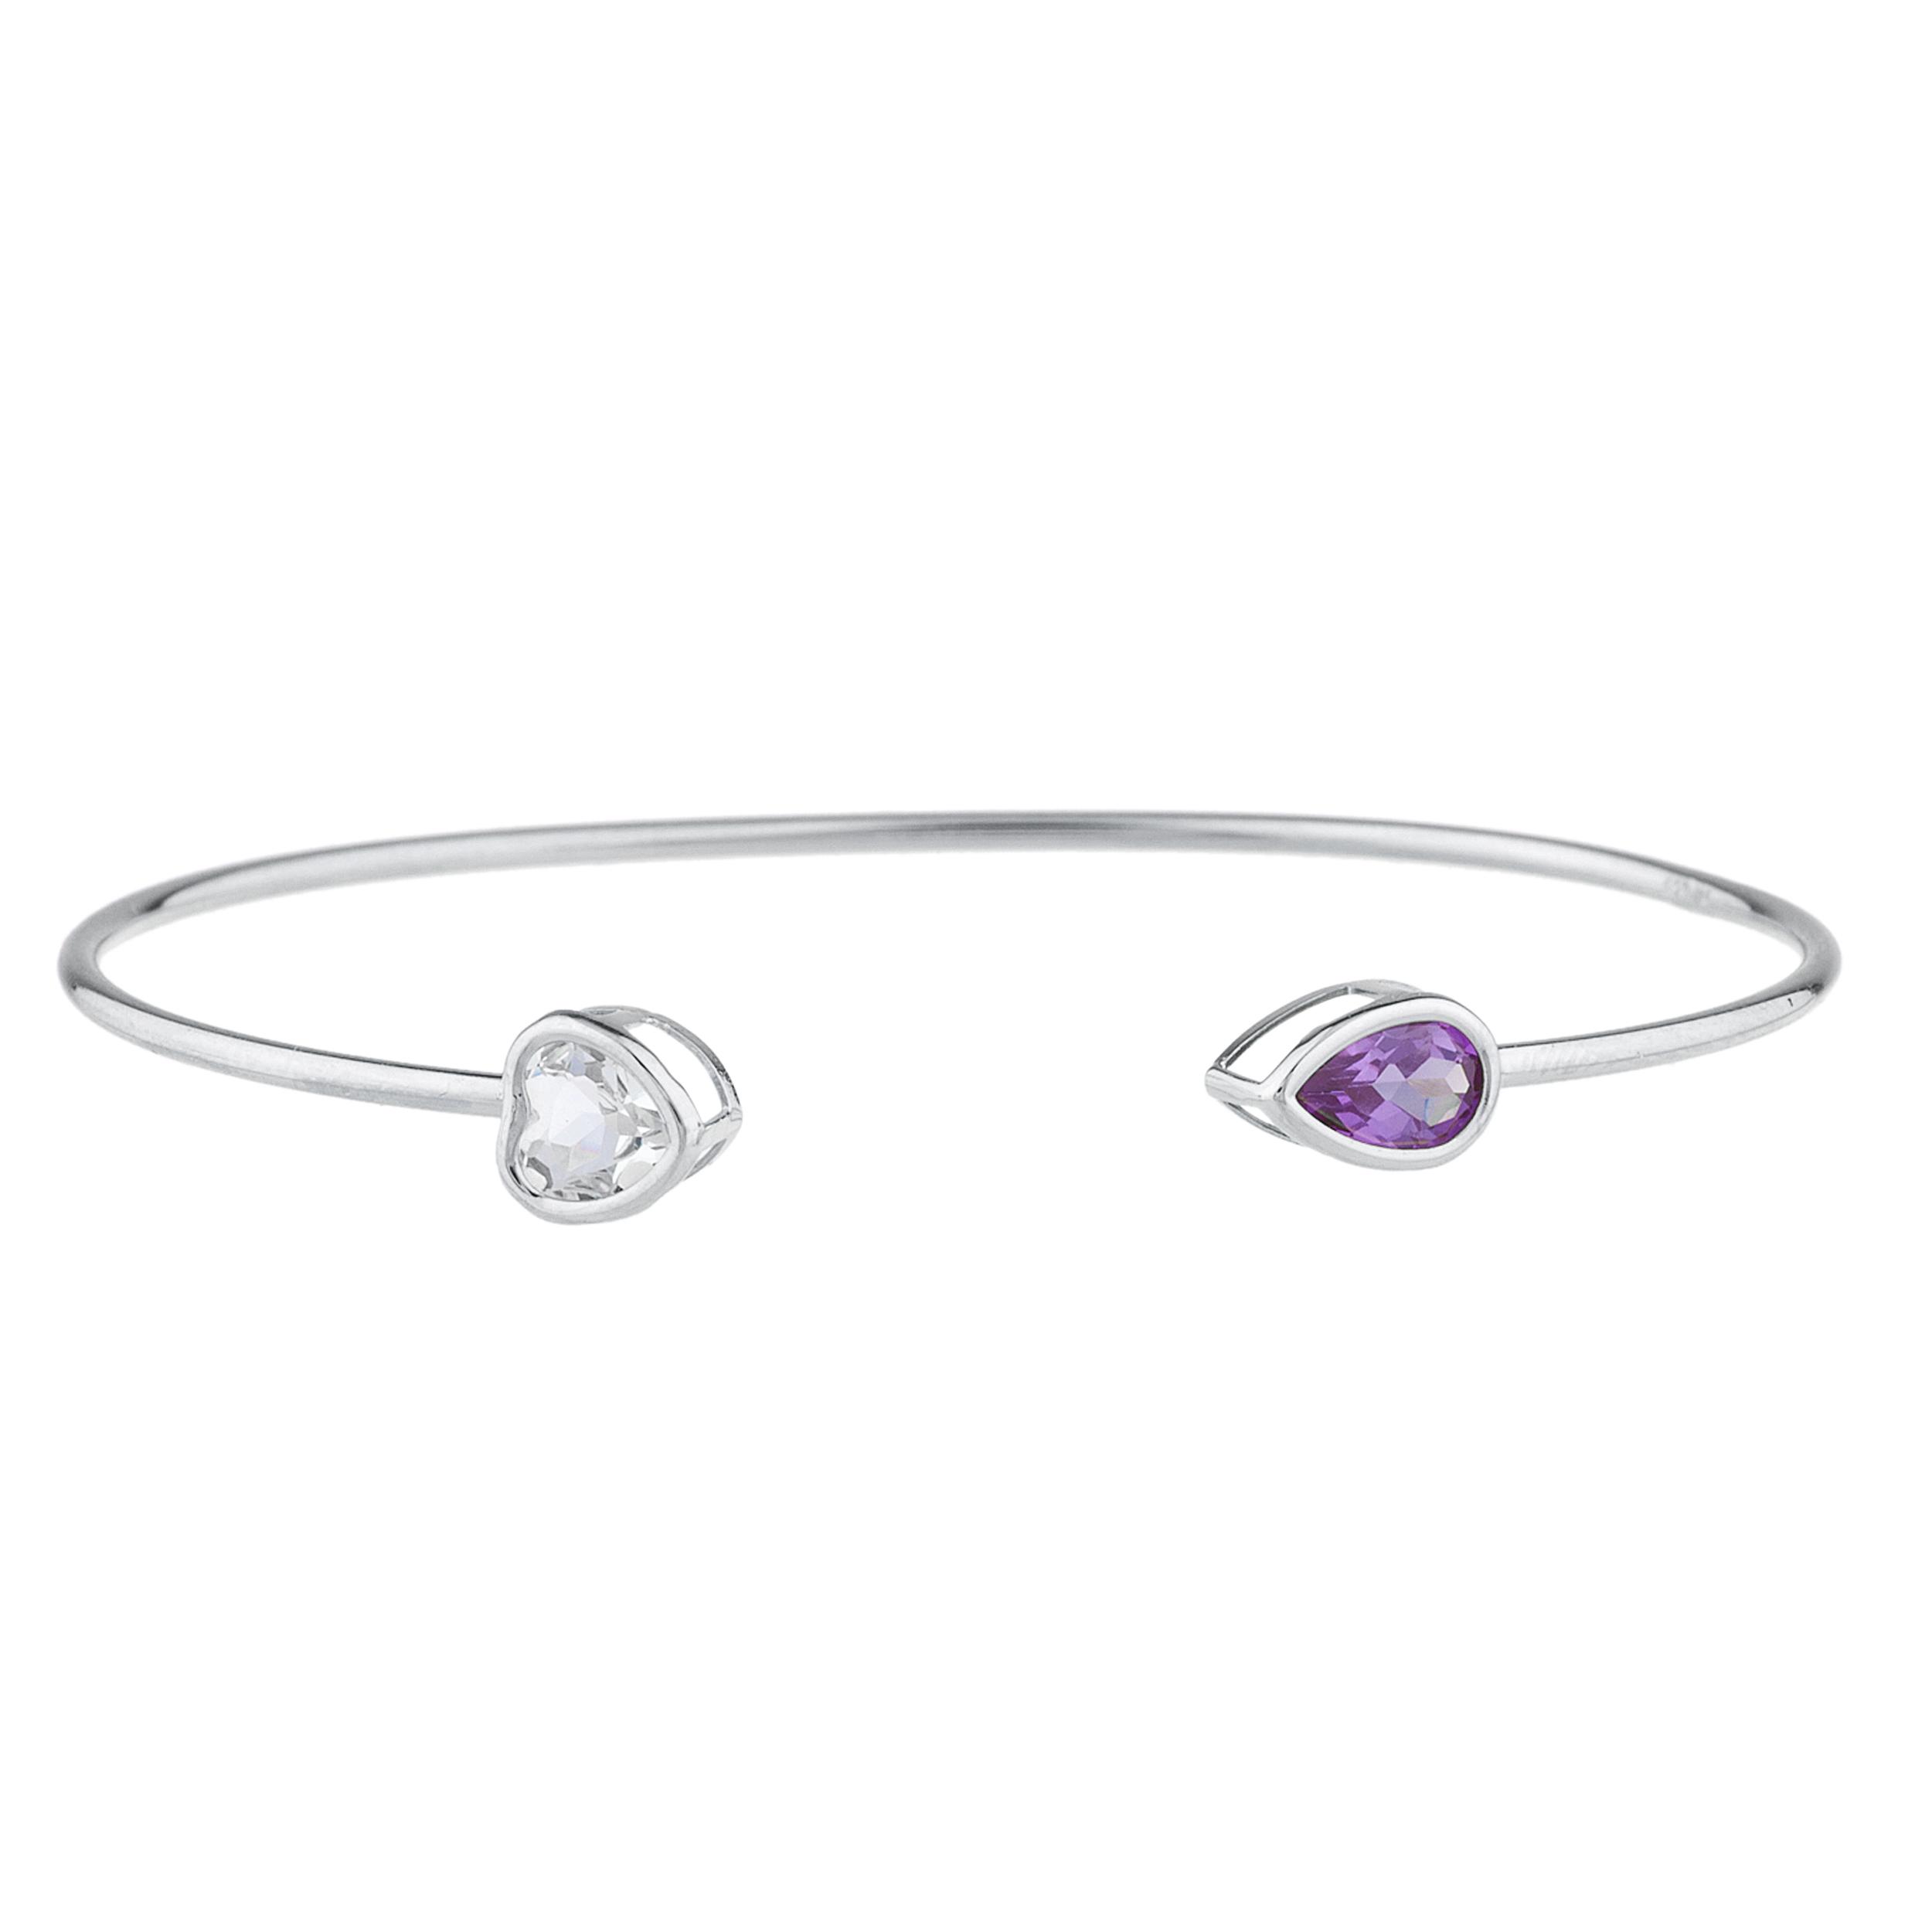 Genuine Aquamarine Heart & Amethyst Pear Bezel Bangle Bracelet .925 Sterling Silver Rhodium Finish by Elizabeth Jewelry Inc